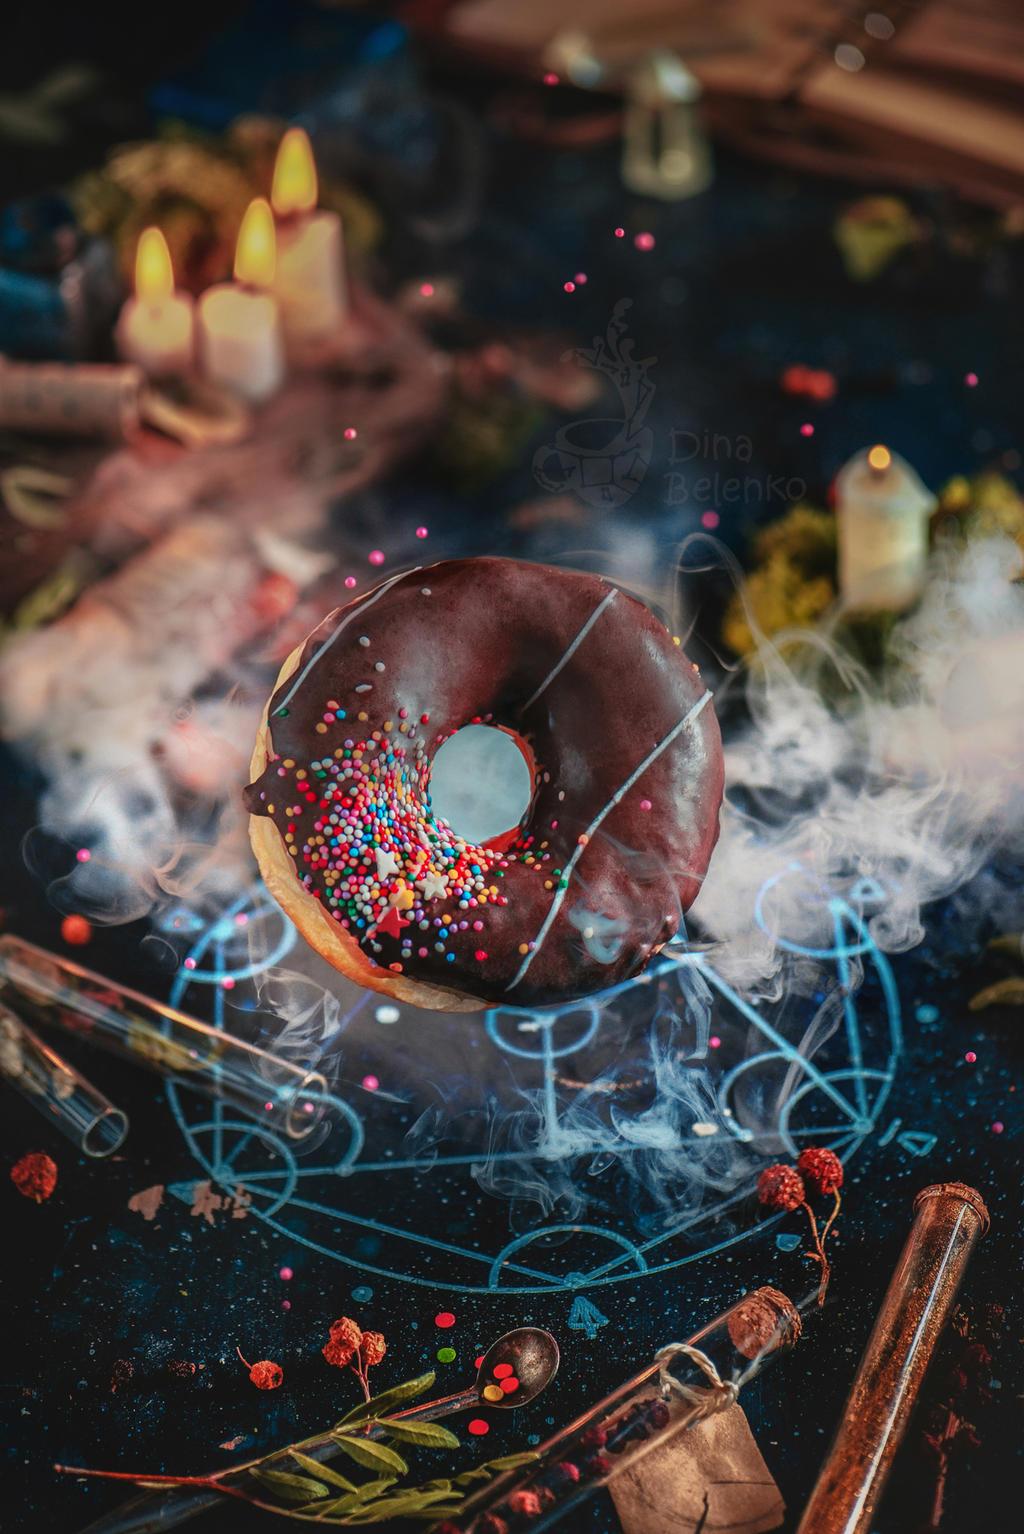 Alchemy Donut by dinabelenko